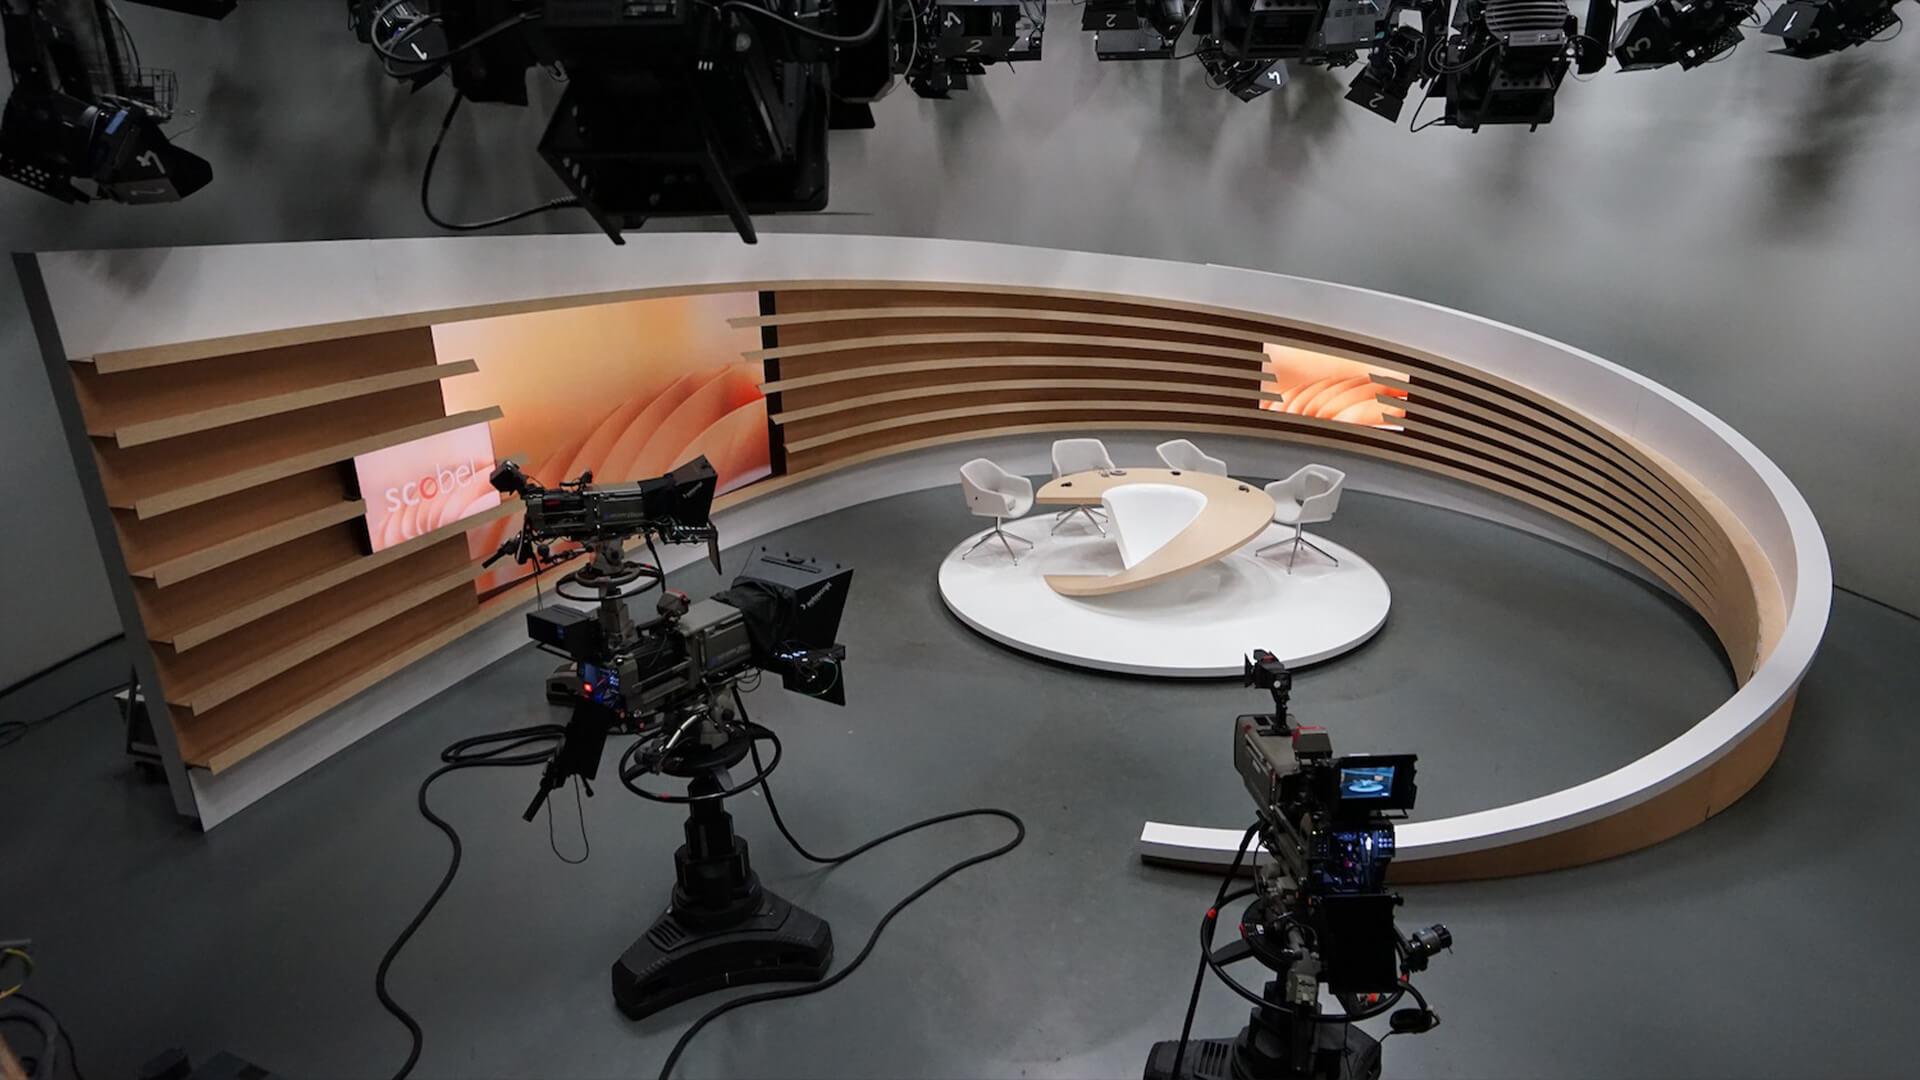 3sat – TV Setdesign 6